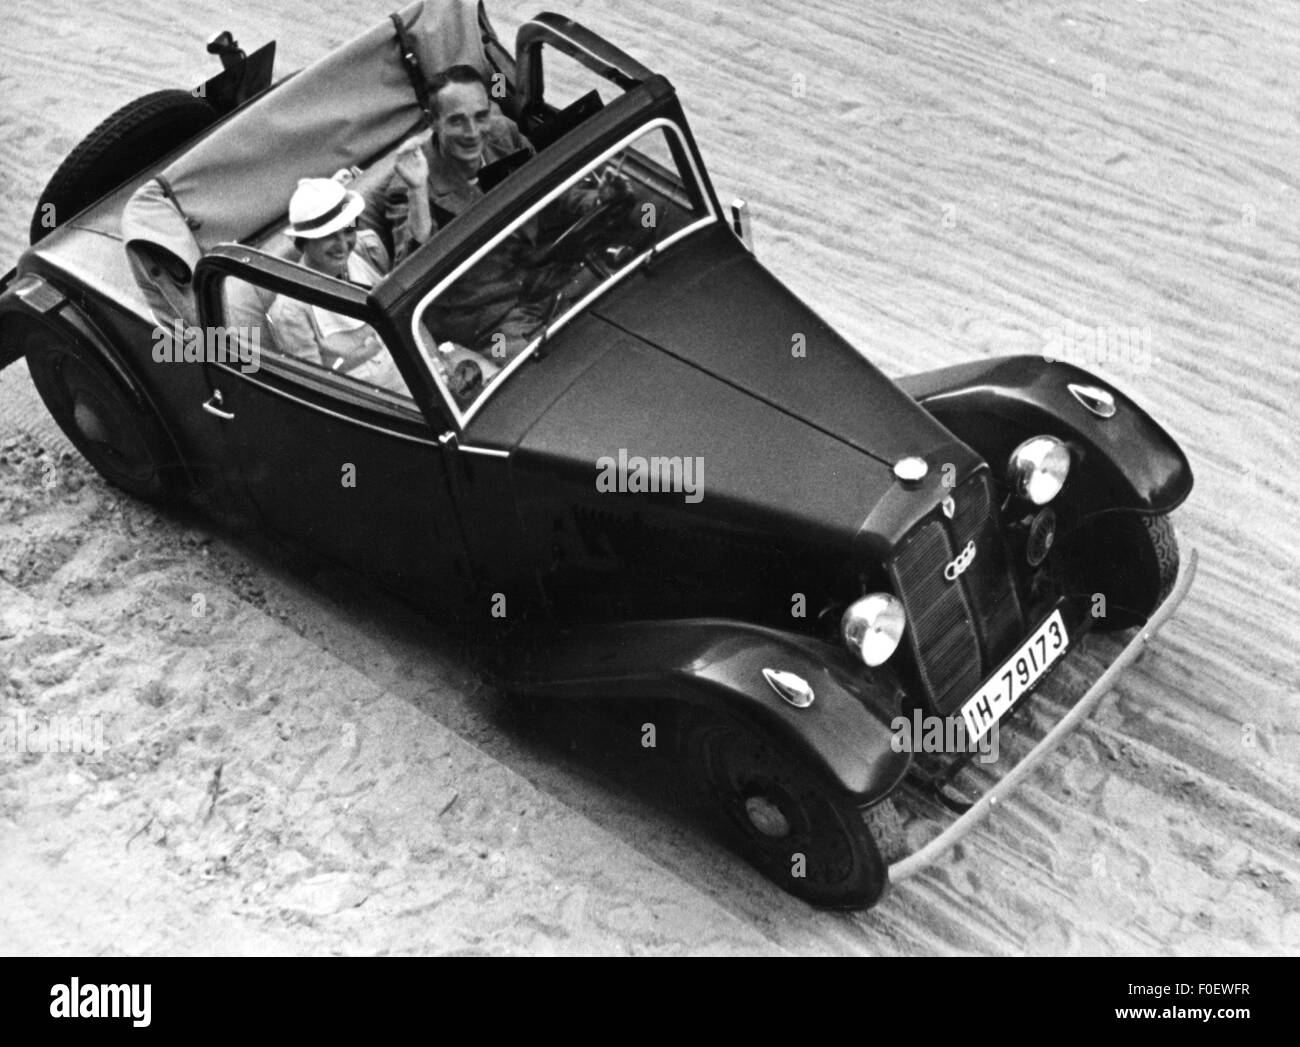 Verkehr / Transport, Auto, Fahrzeugvarianten, Audi Front, Ansicht ...